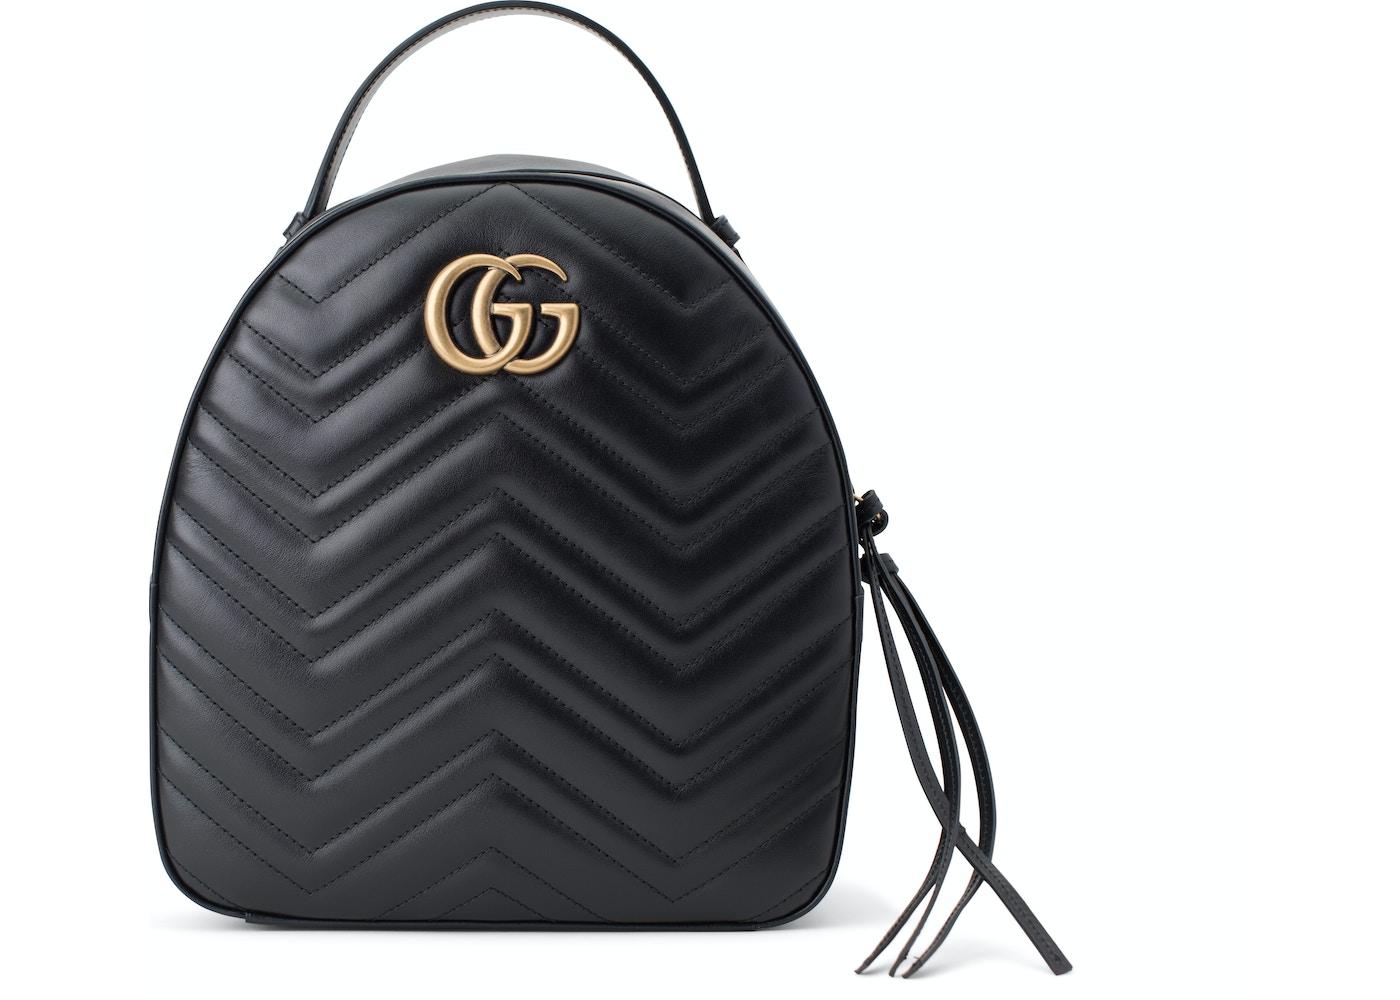 f90df8fdecb Gucci Marmont Backpack GG Interlocking. GG Interlocking